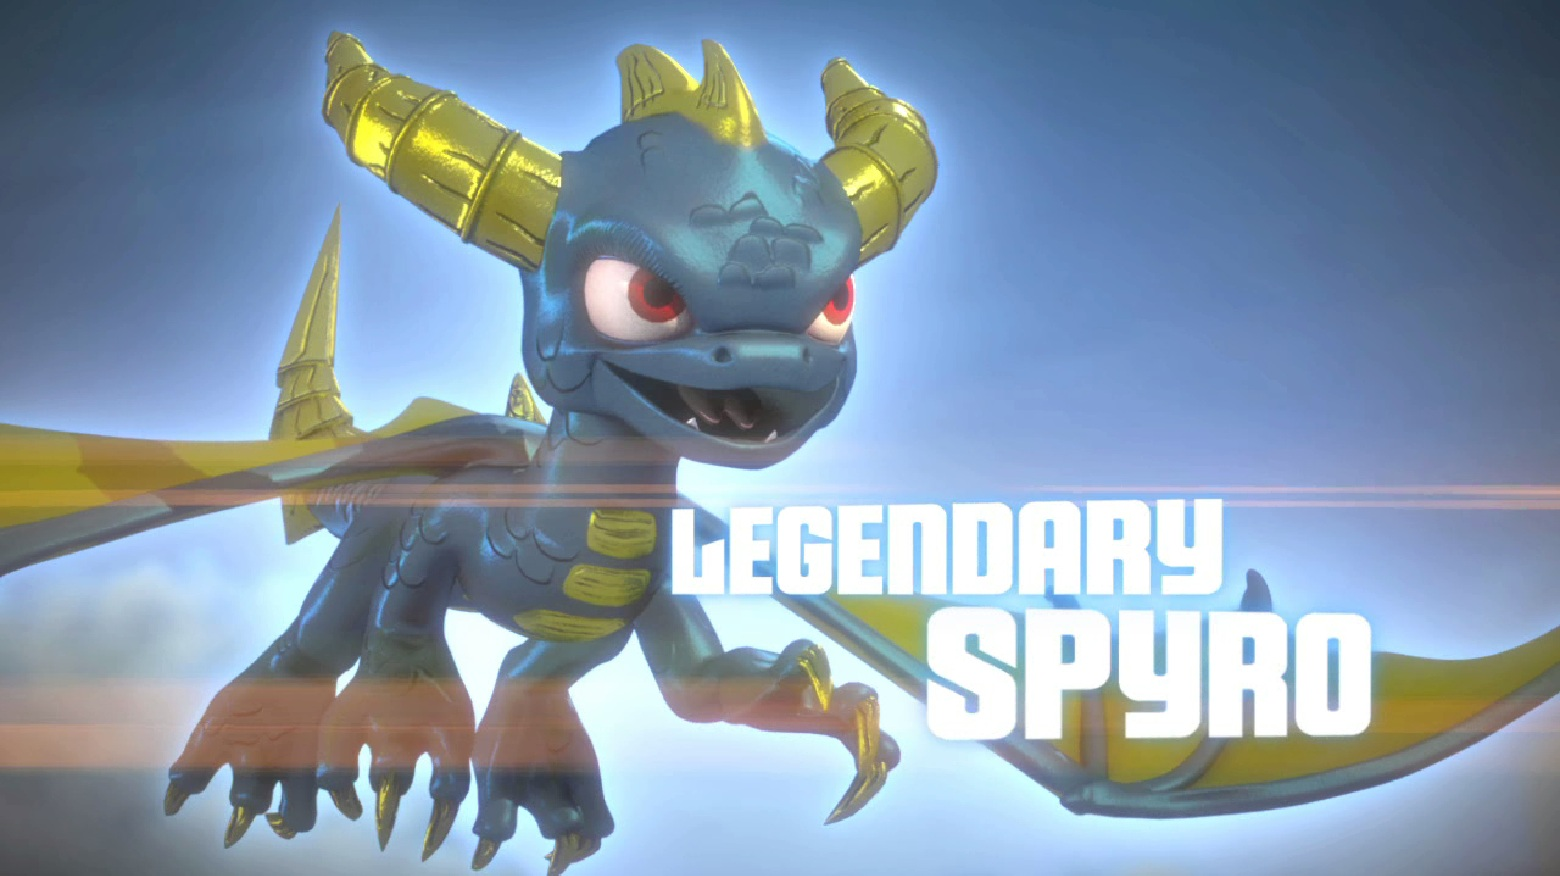 Image - Legendary Spyro Trailer.jpg - Portal Masters of ...